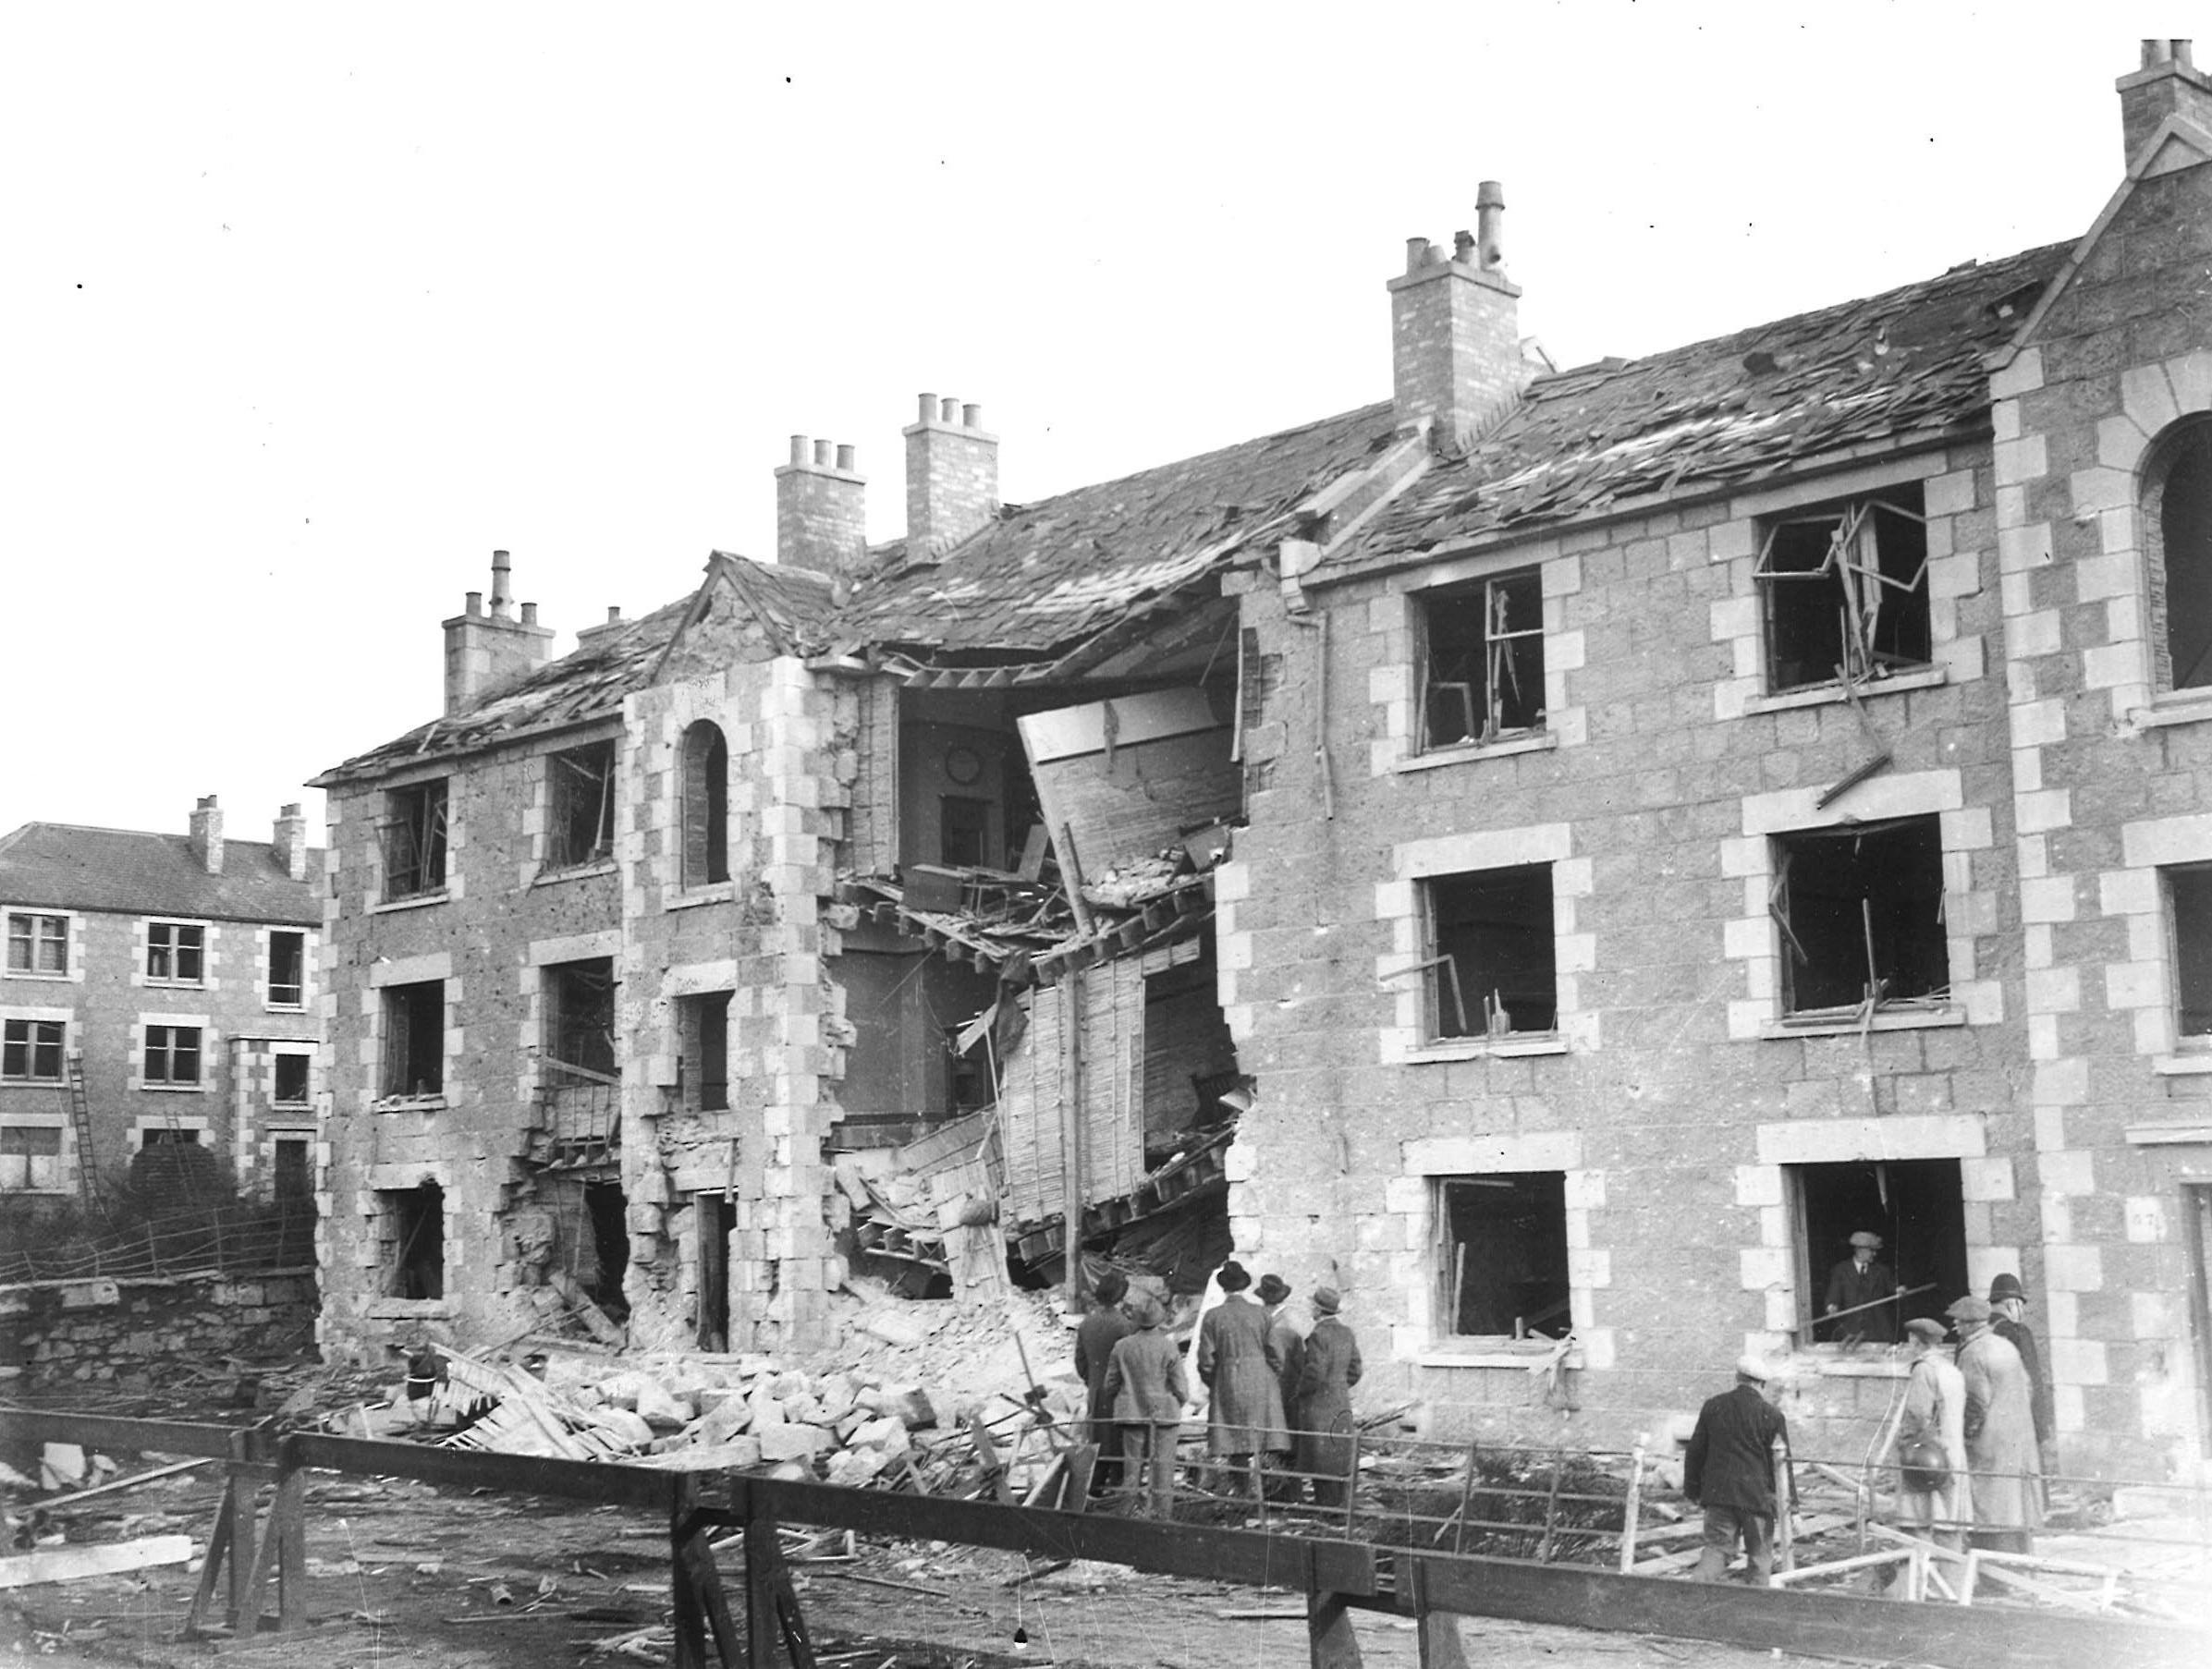 Damage after an air raid on Wellington Road, 4 November 1940